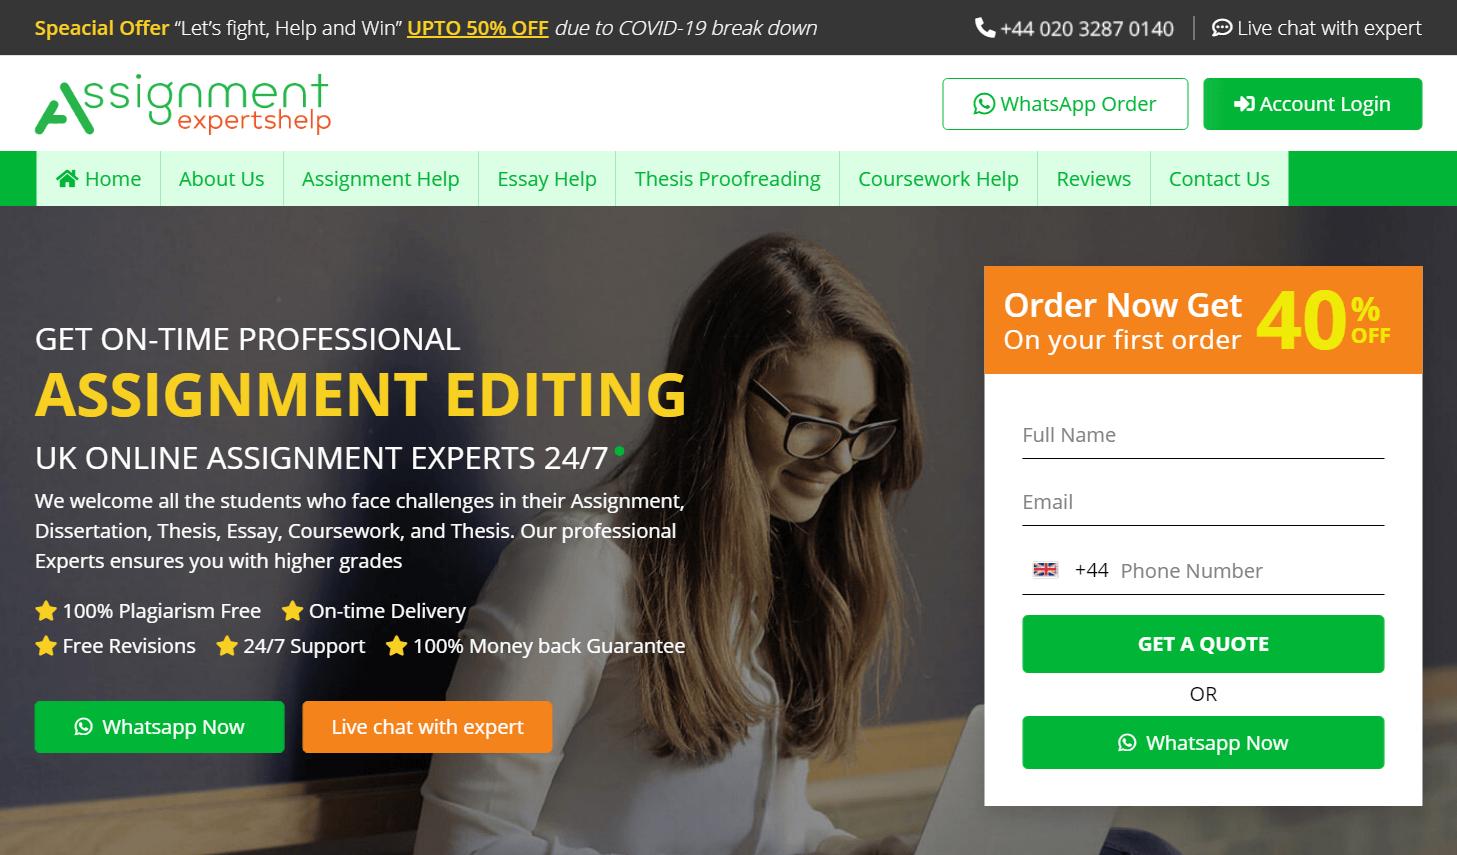 assignmentexpertshelp.com